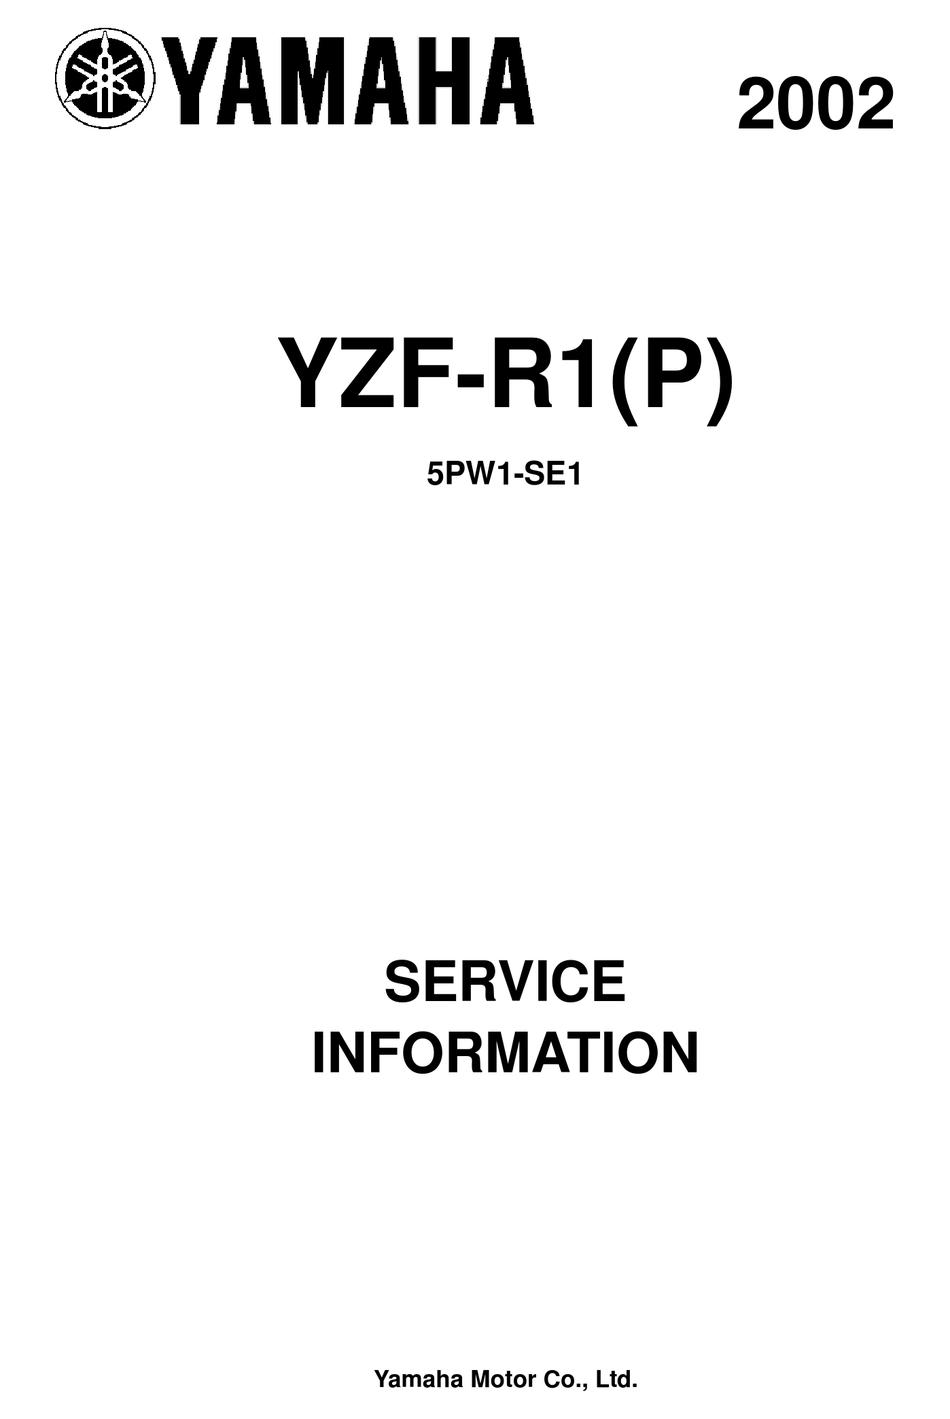 YAMAHA YZF-R1(P) 2002 SERVICE INFORMATION Pdf Download